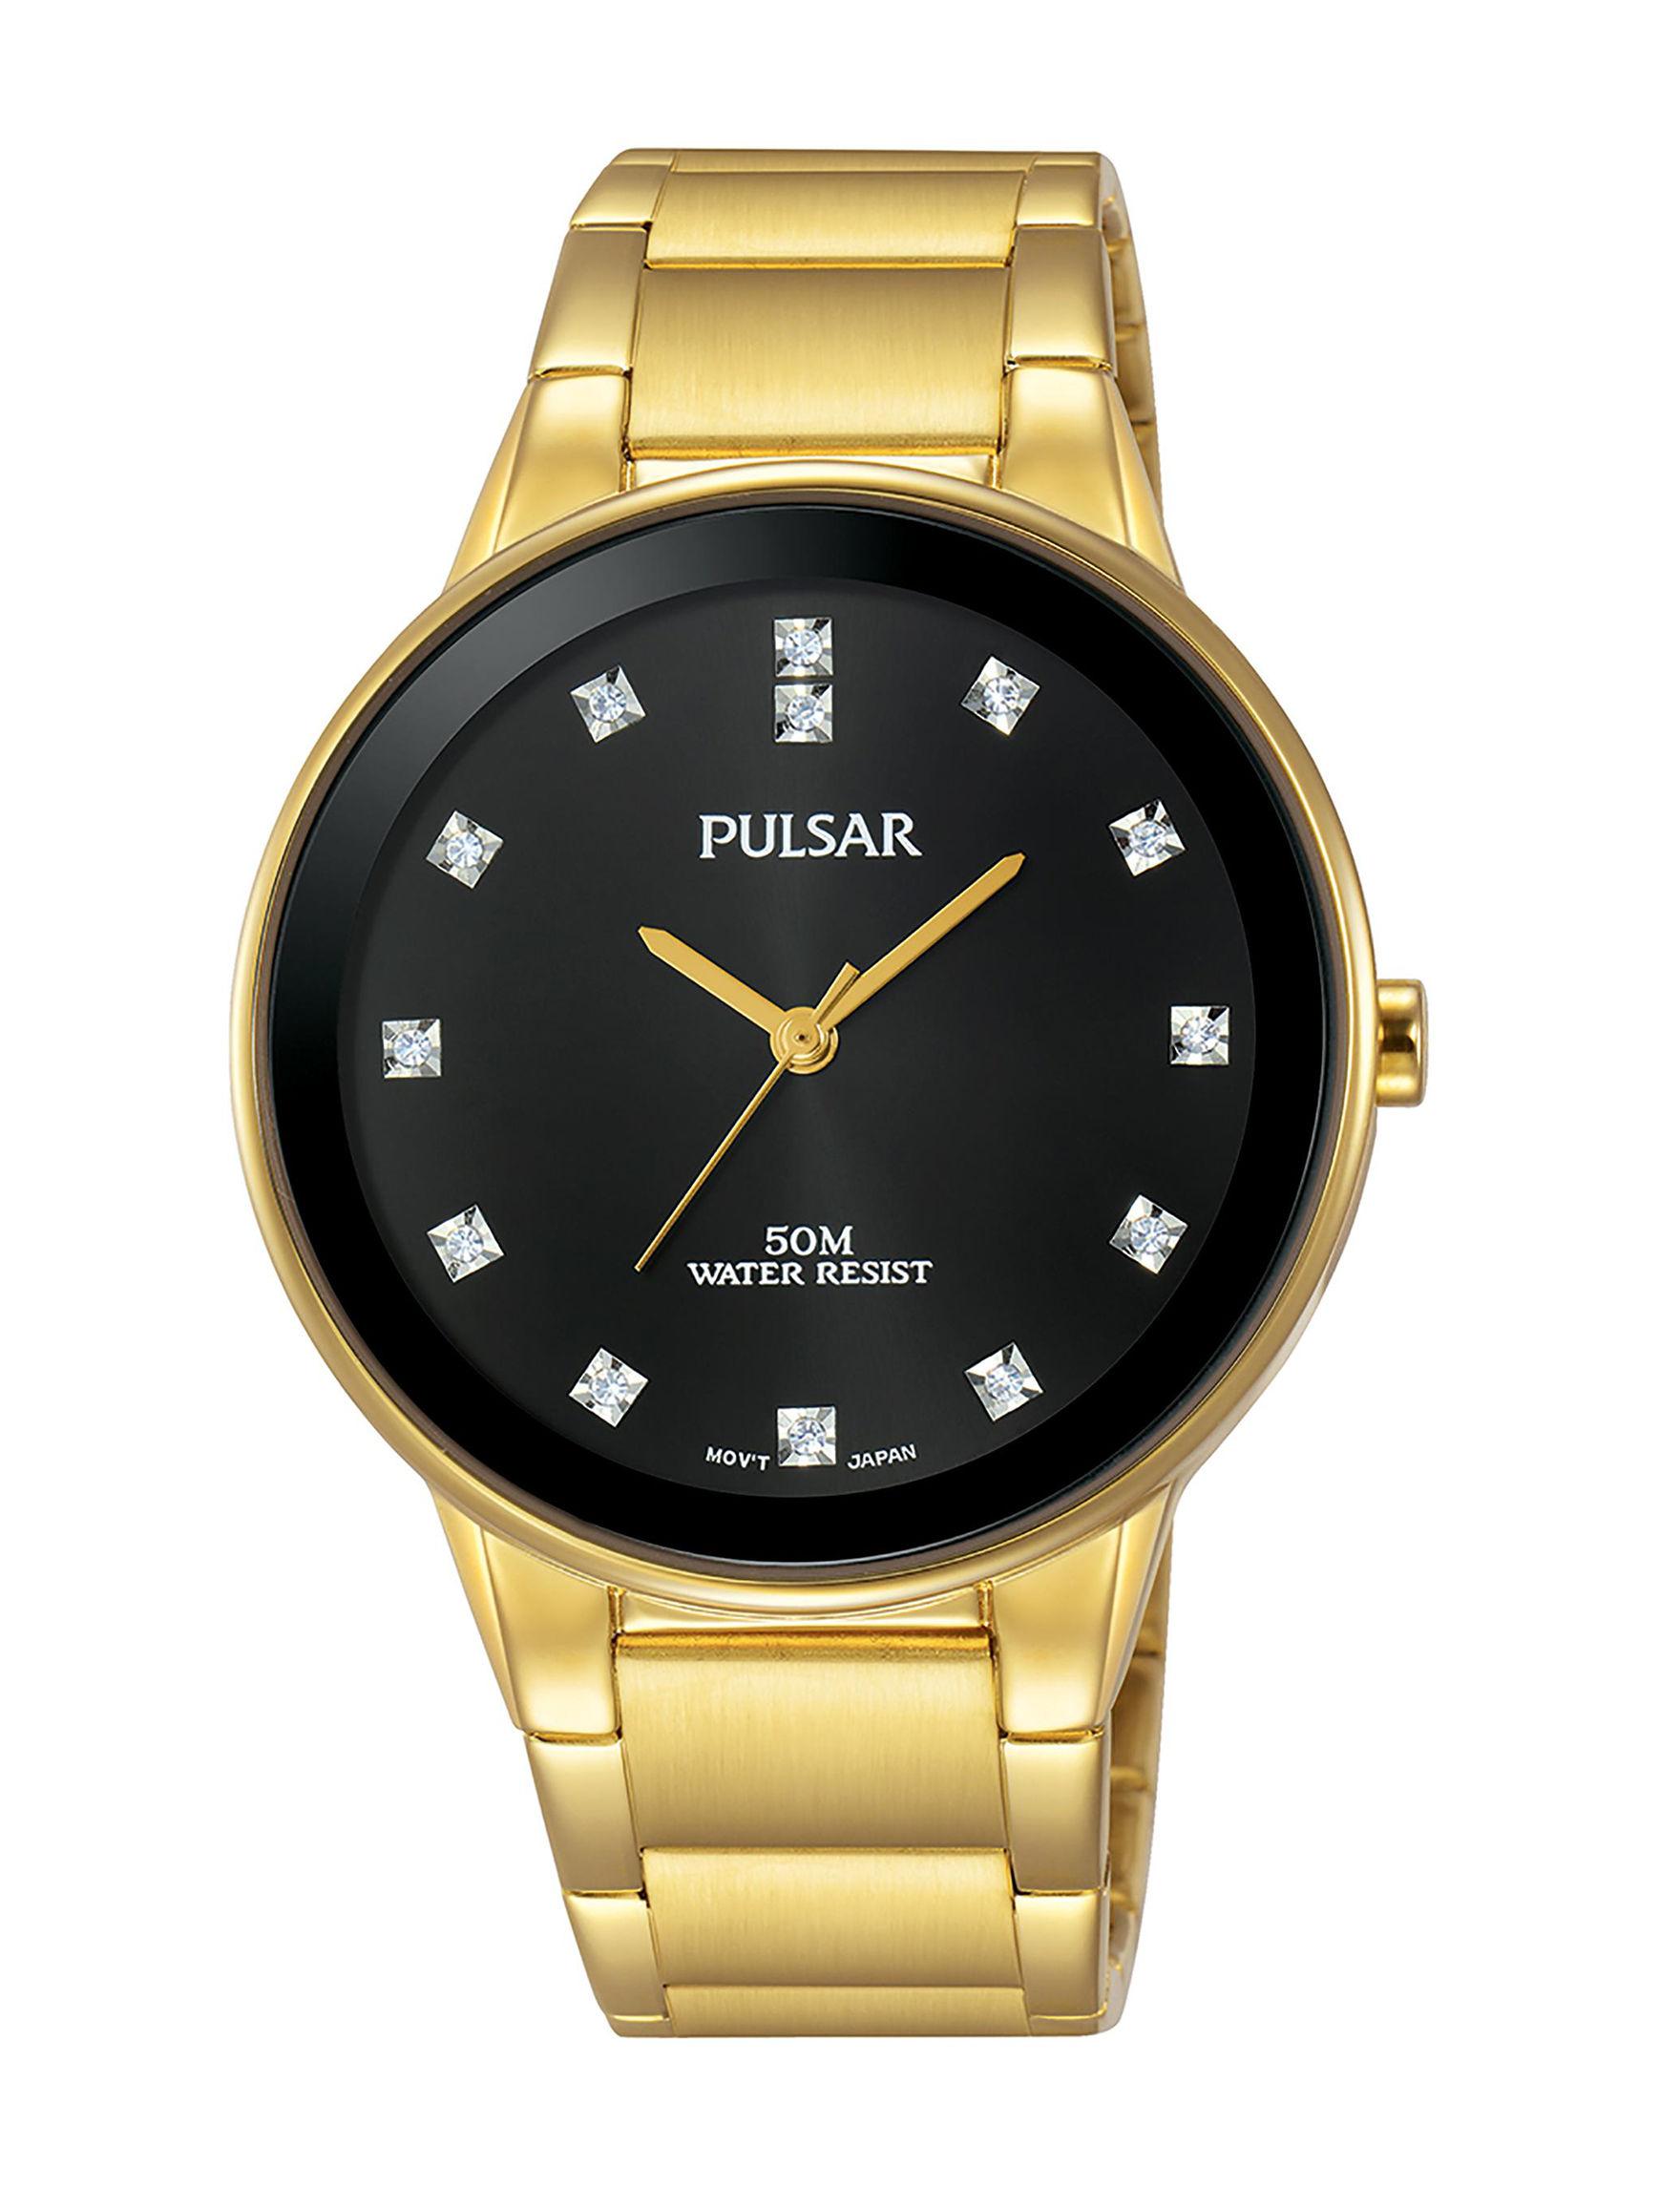 Pulsar Gold Fashion Watches